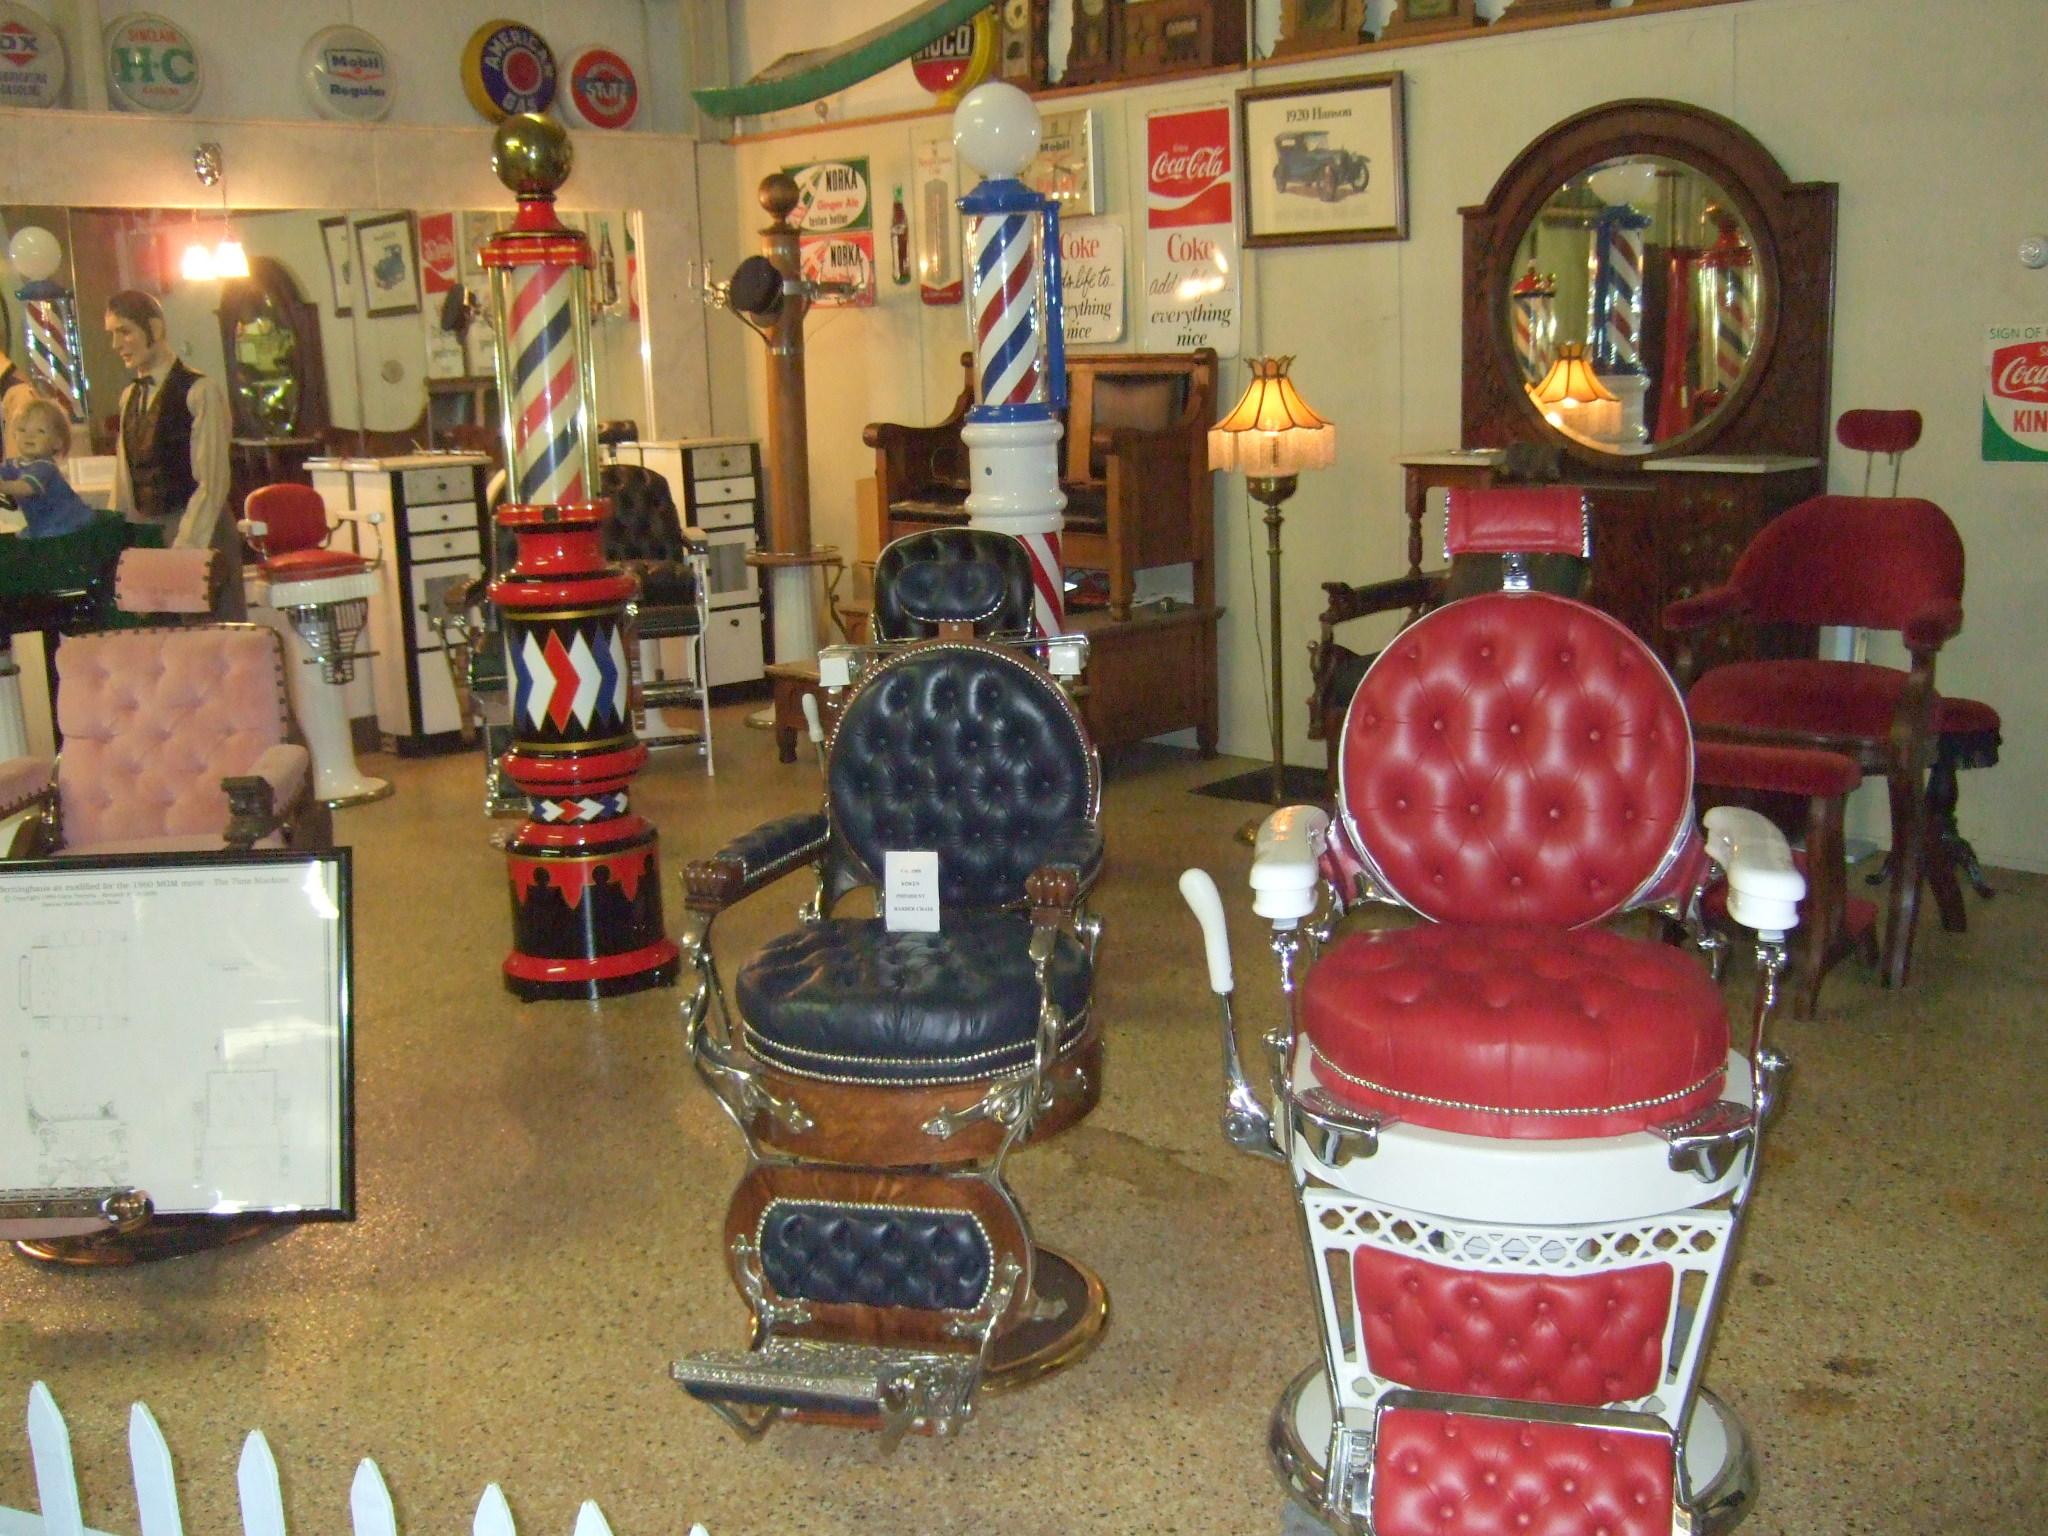 kids car barber chair dining room covers ebay uk 2593420627 72a62acc5f o d jpg 2 0481 536 pixels